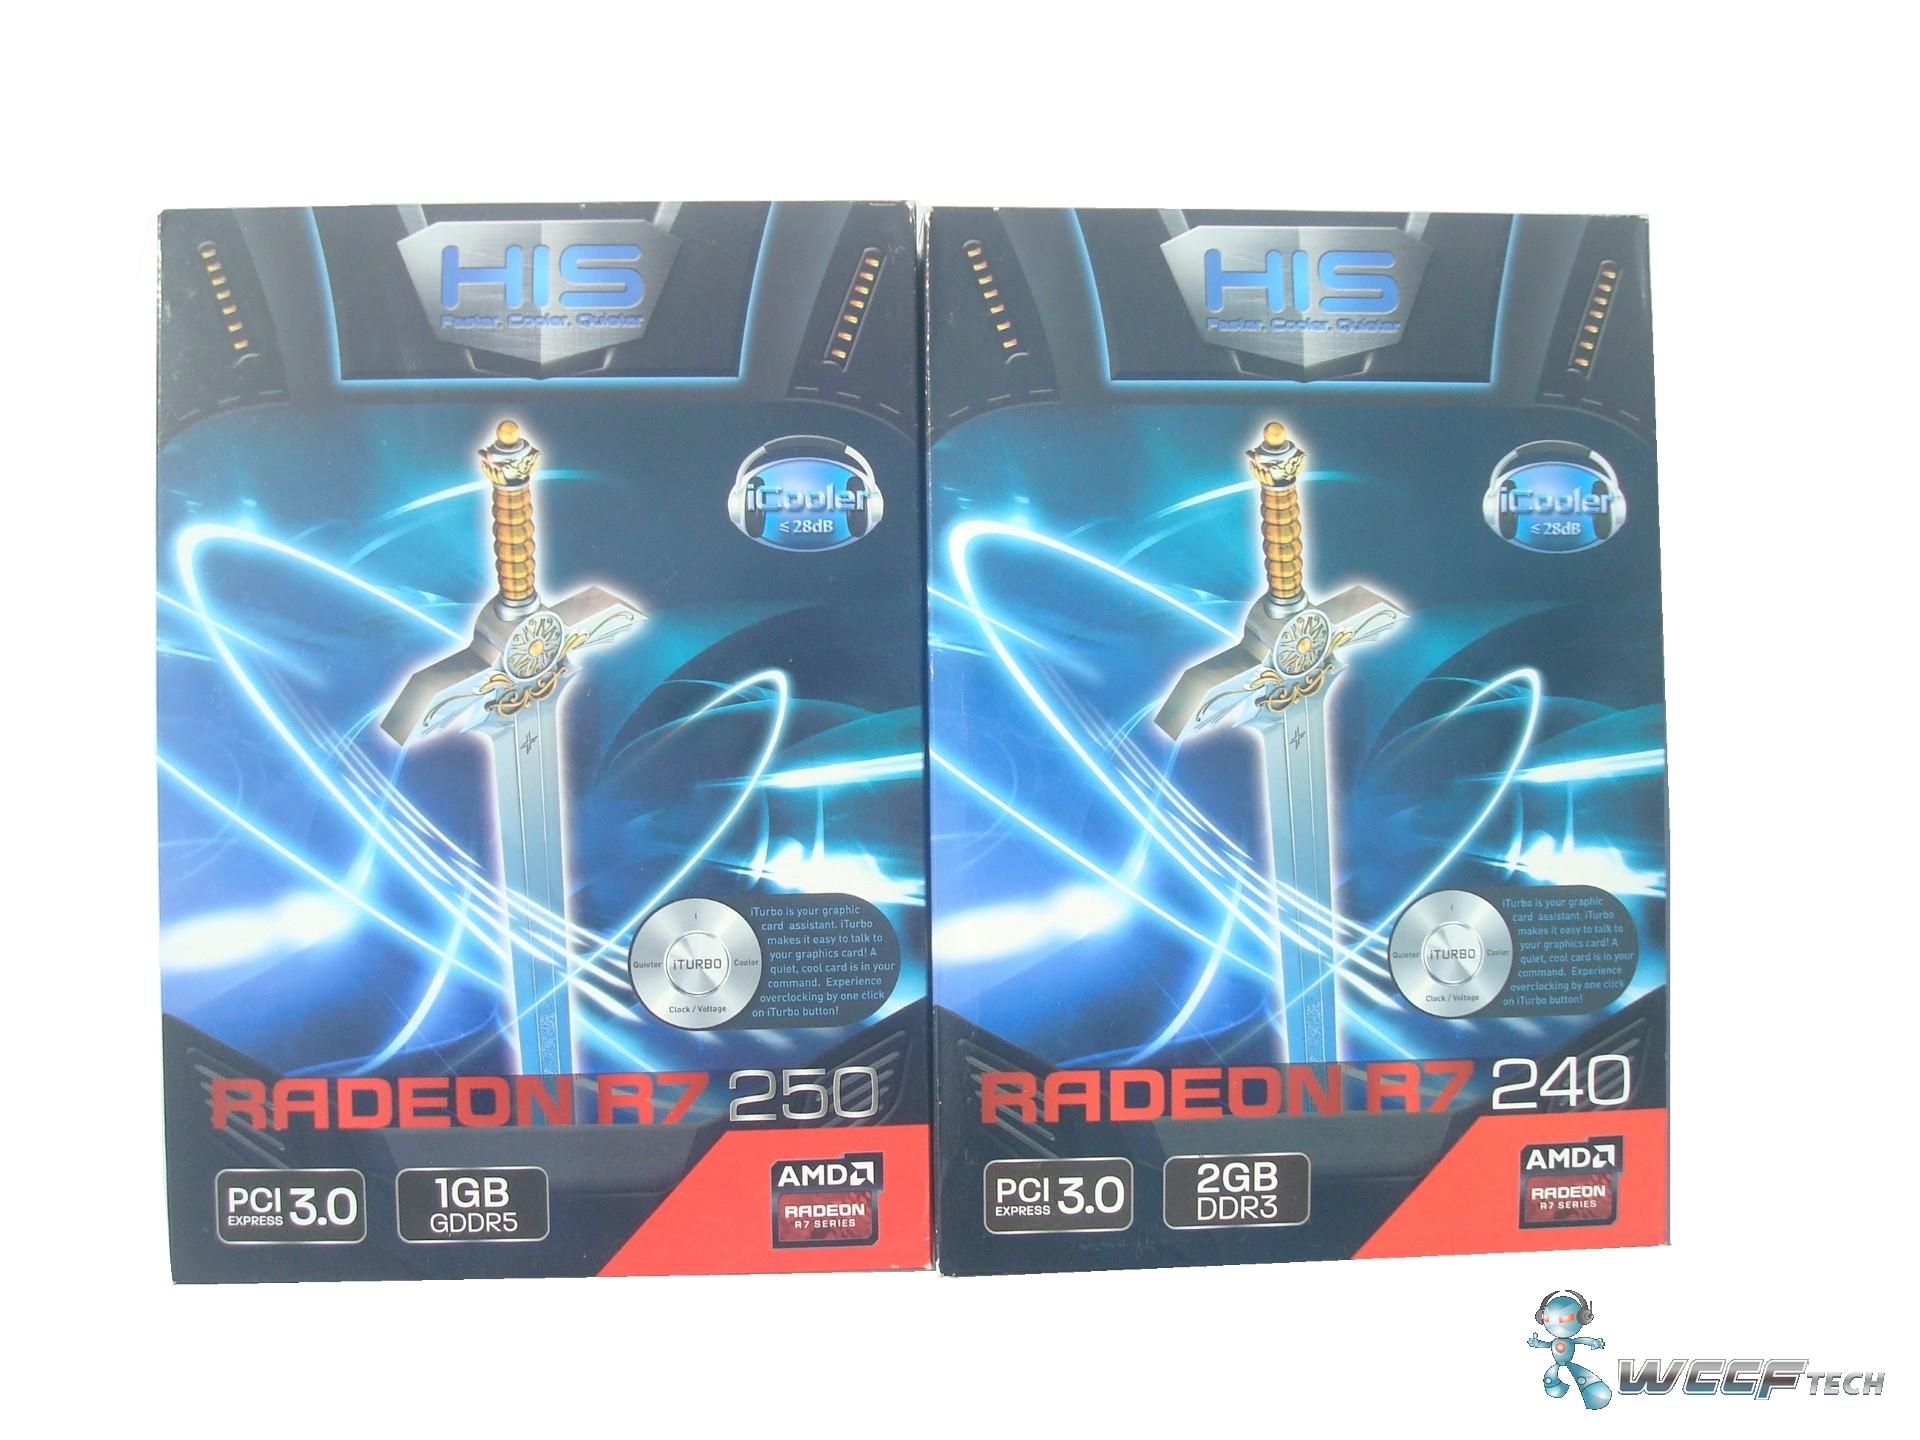 HIS Radeon R7 250 iCooler and Radeon R7 240 iCooler Graphic